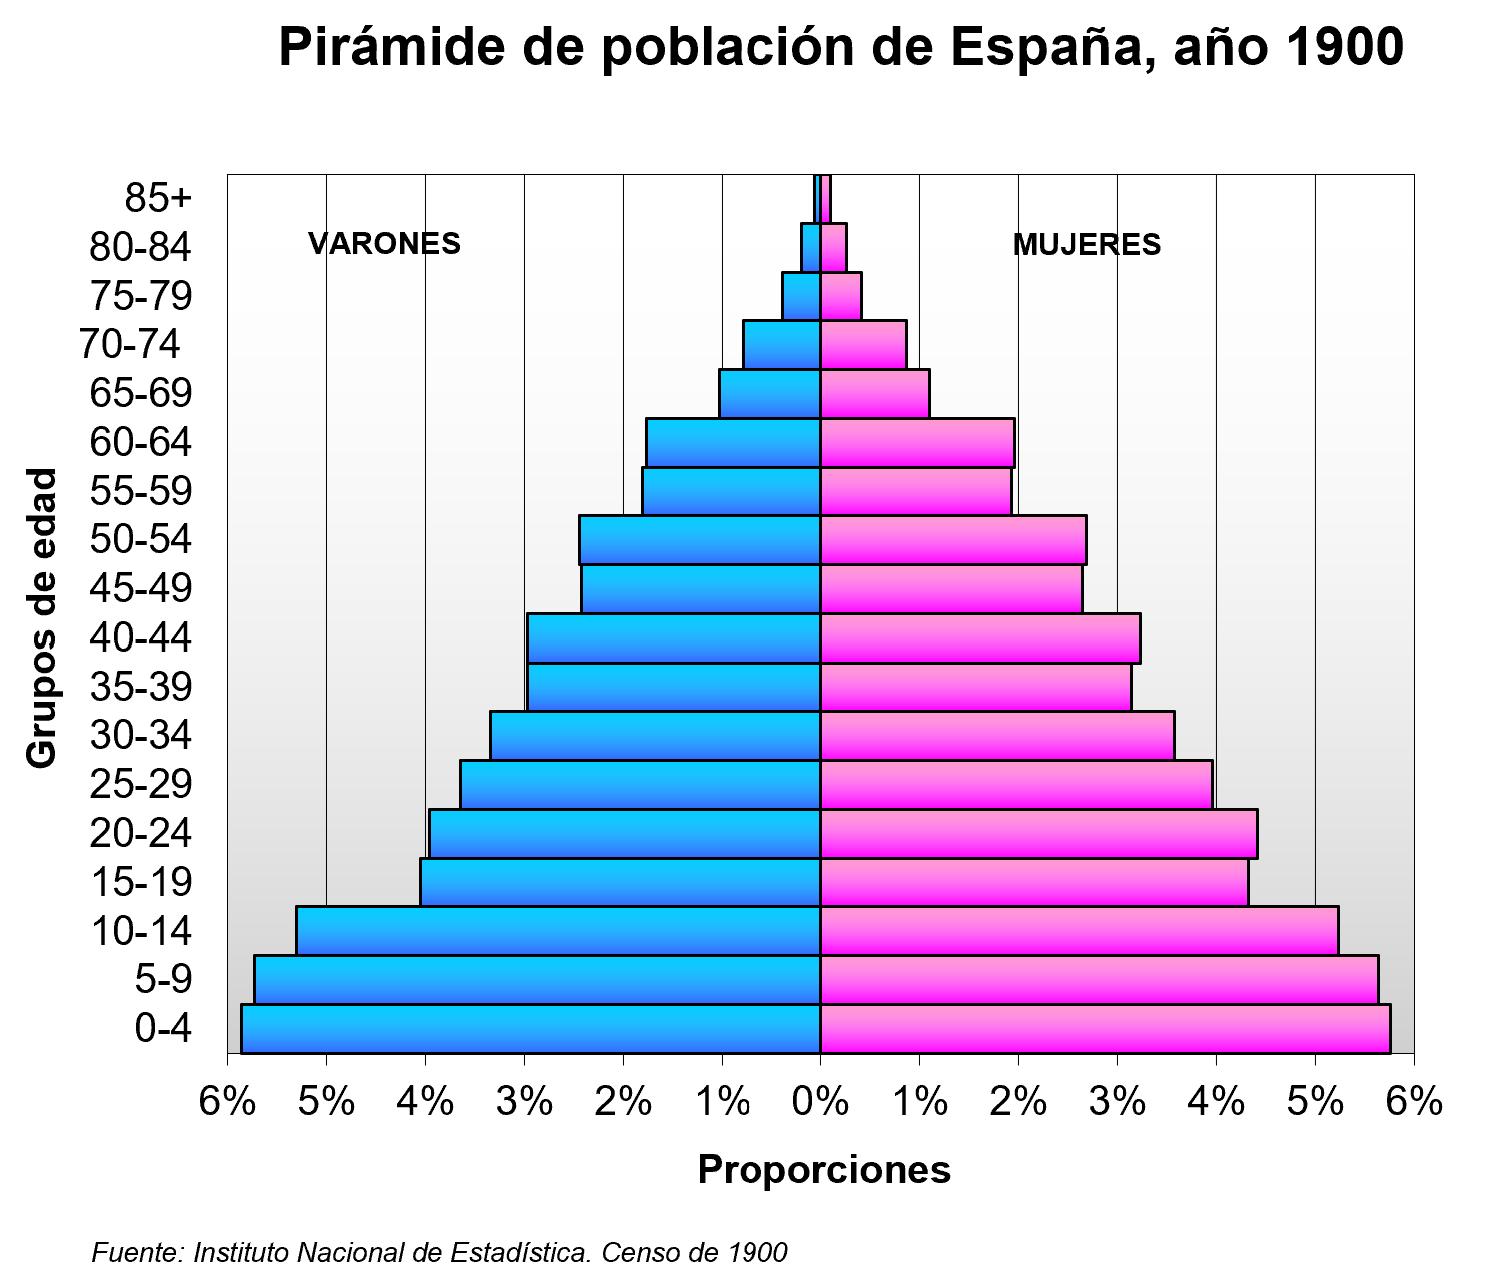 pir mide de poblaci n de espa a 1900 png